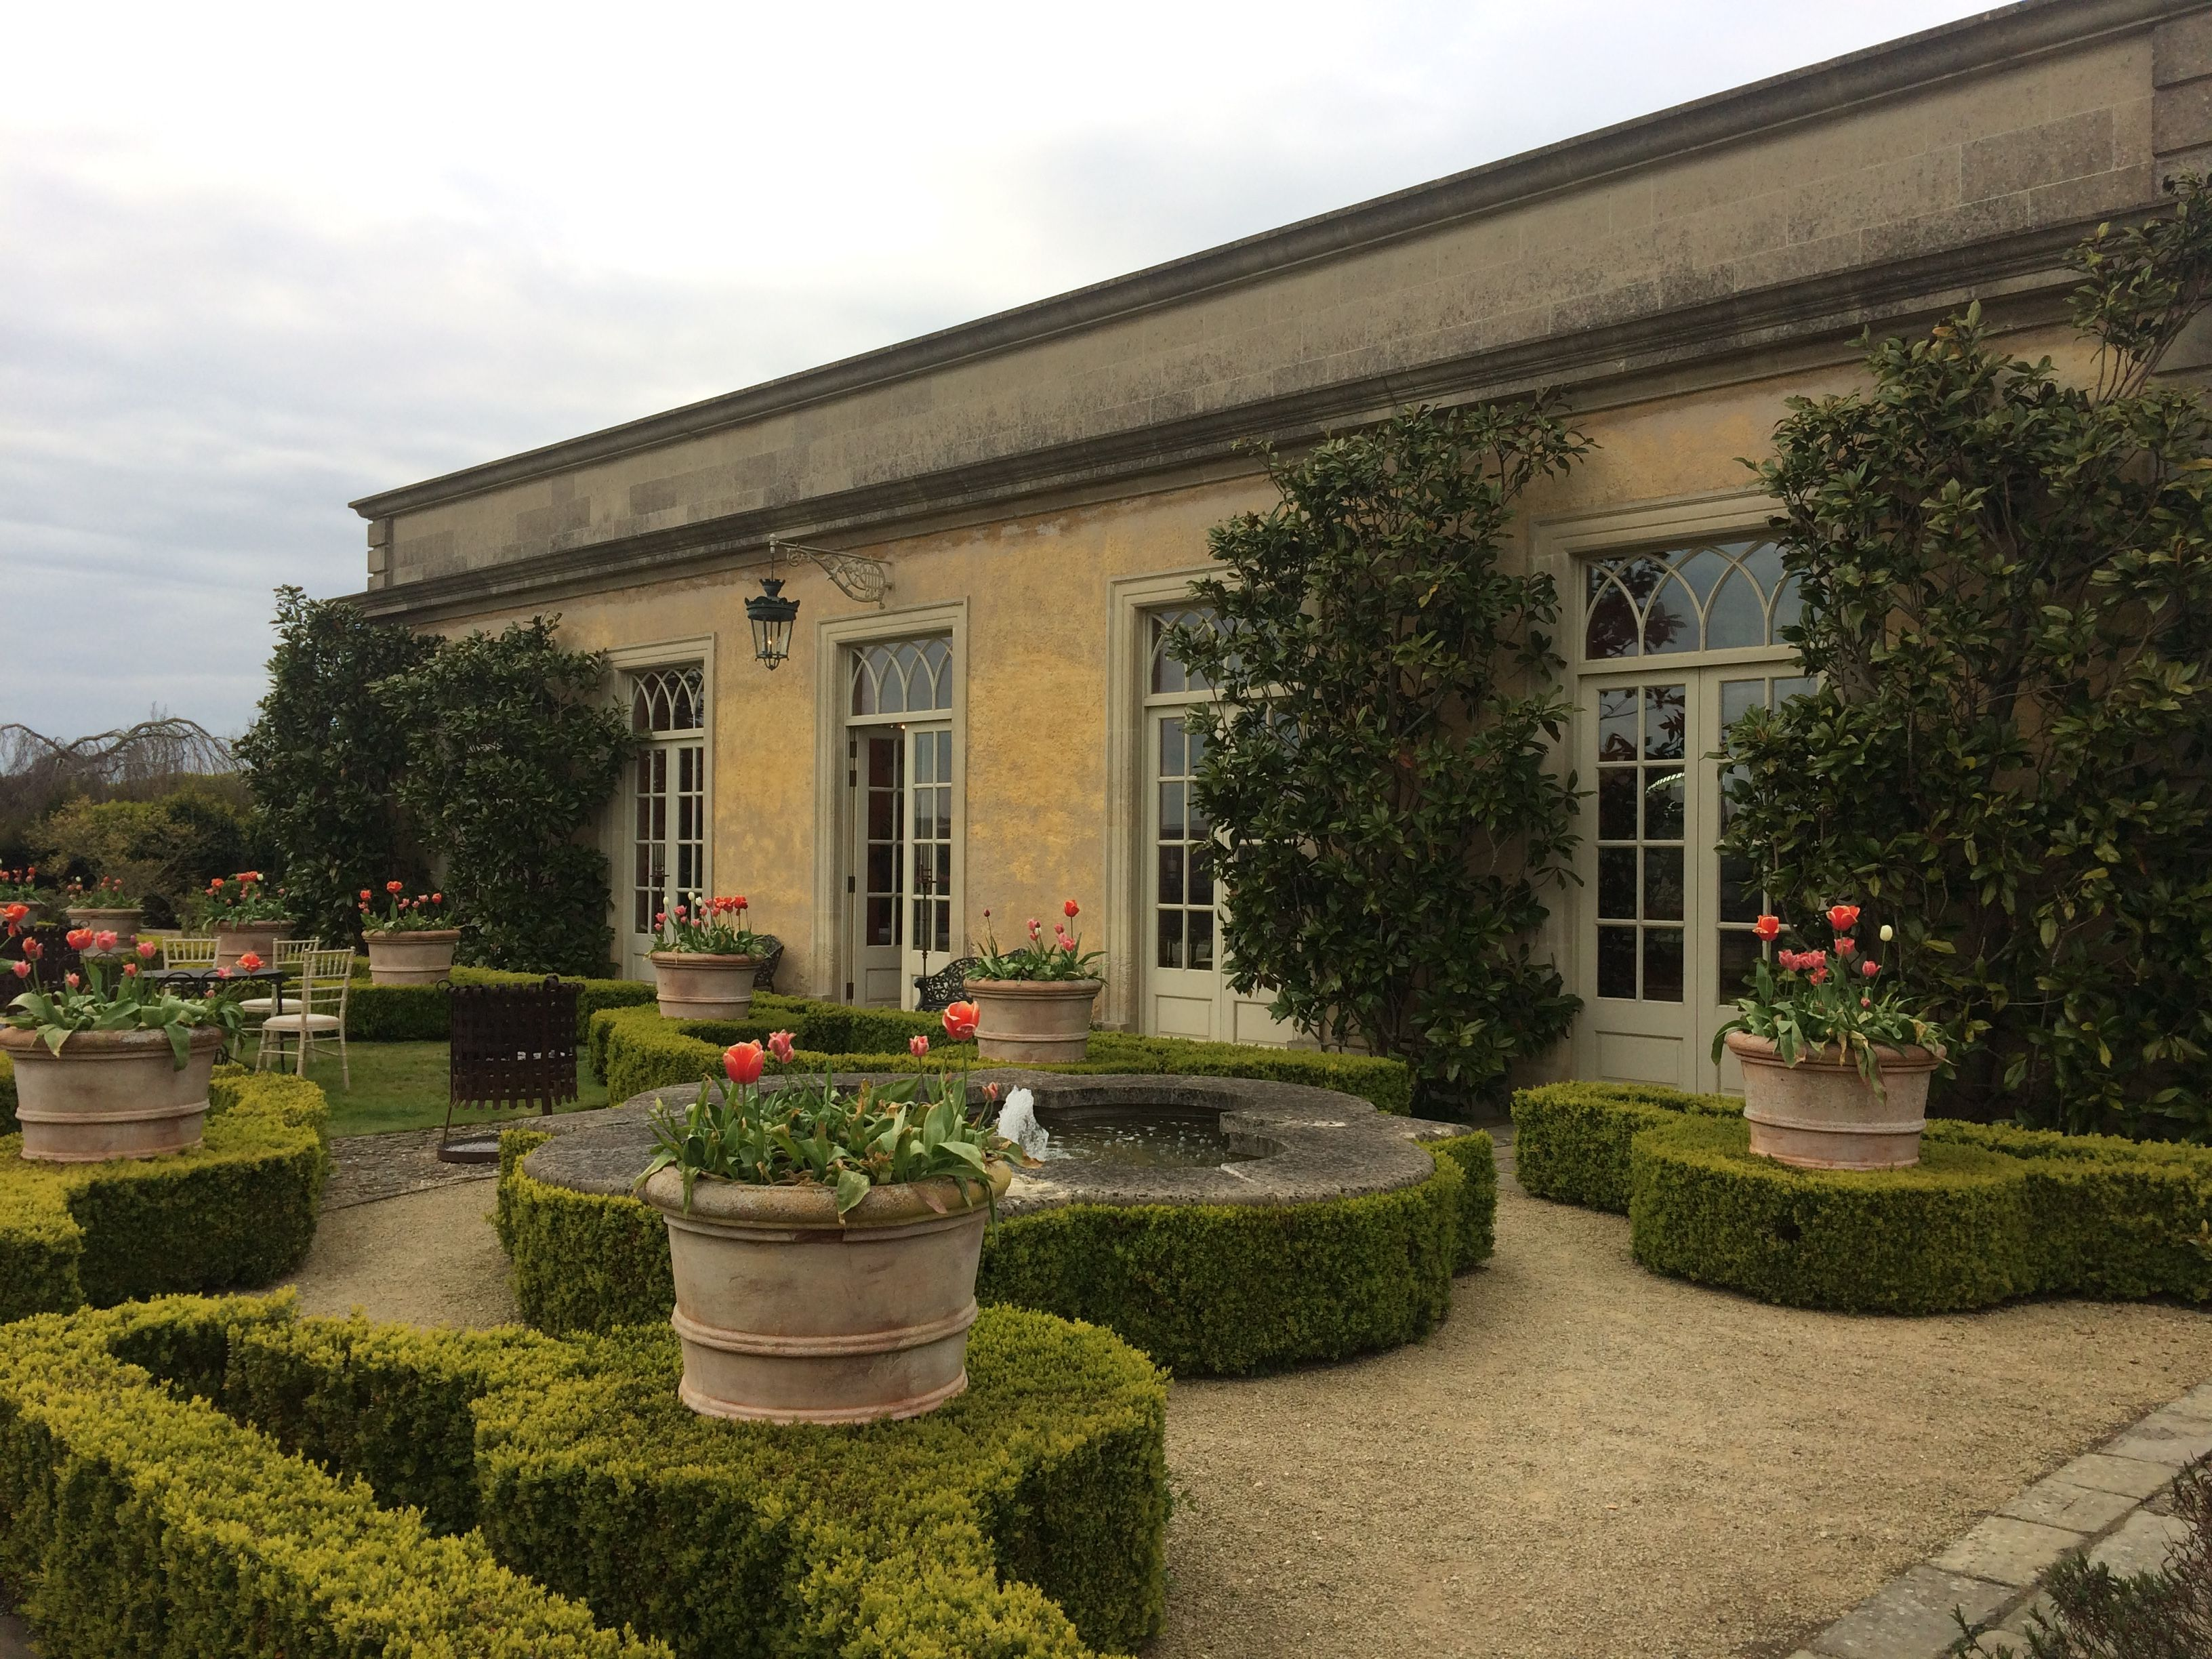 The Lost Orangery, Euridge Manor, UK. #TheBristolStringQuartet #EuridgeManor